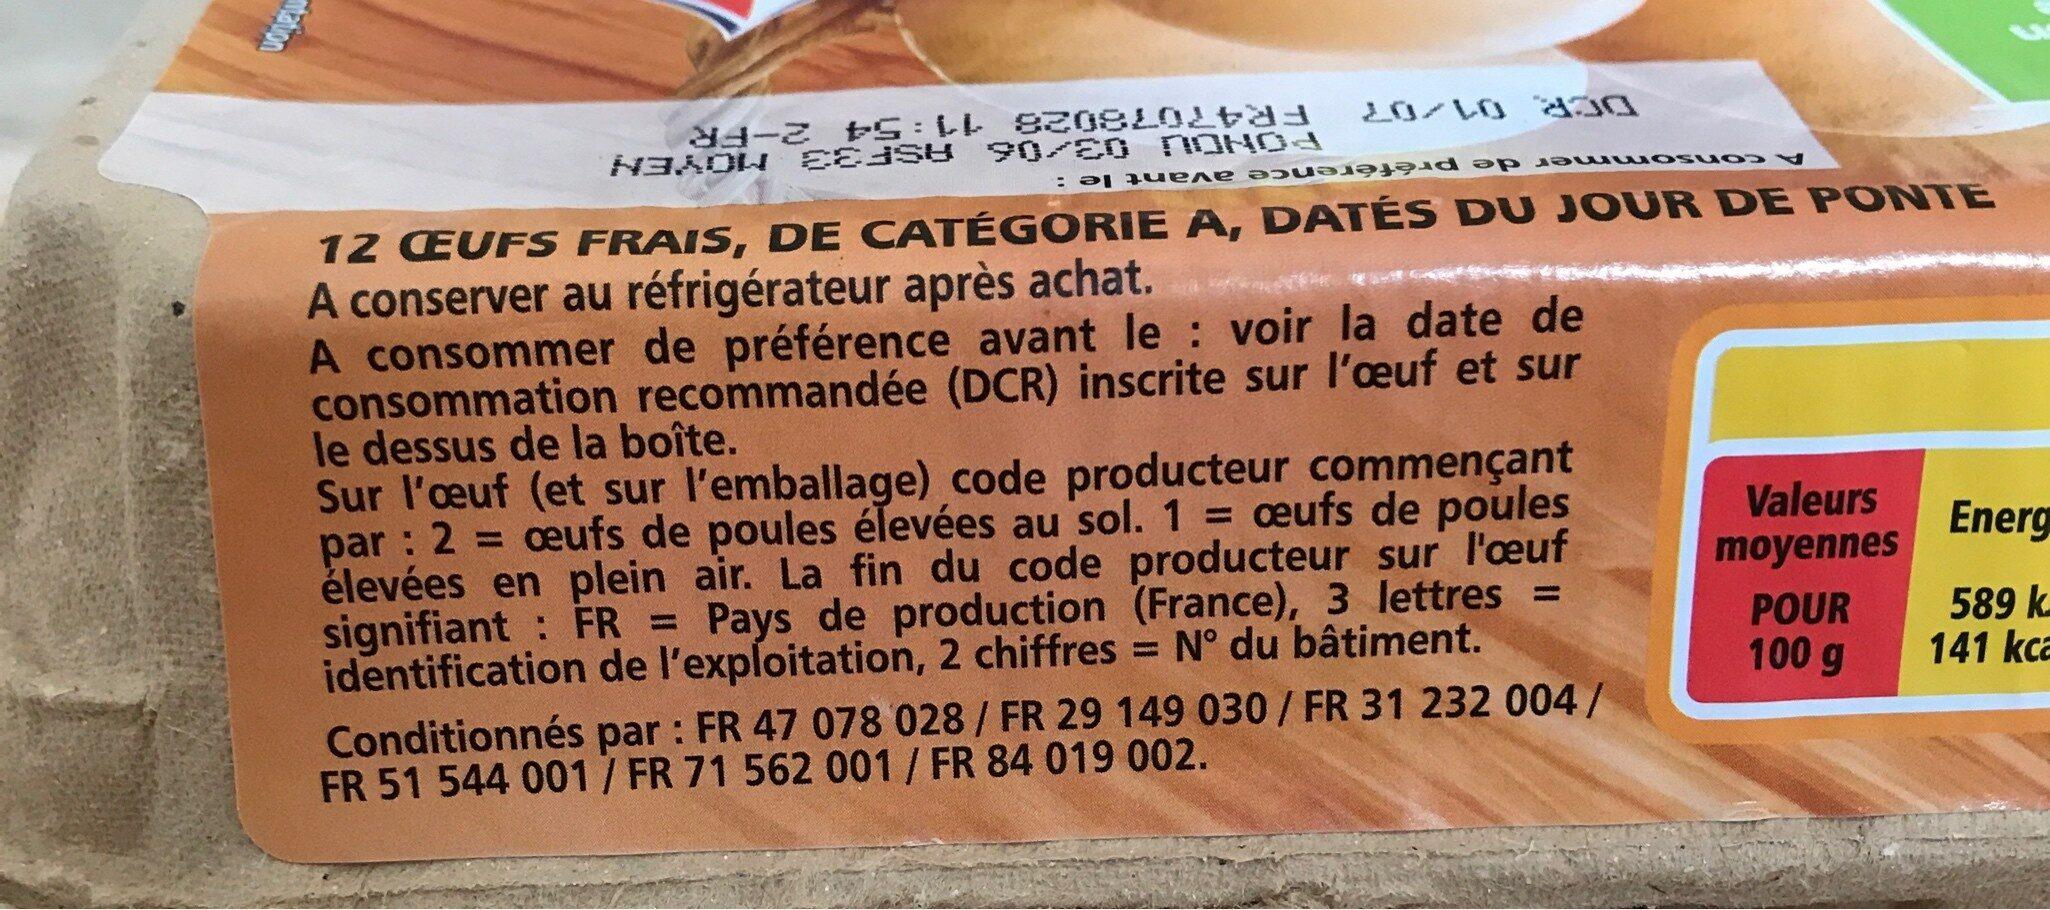 Boite de 12 oeufs casino - Ingredienti - fr